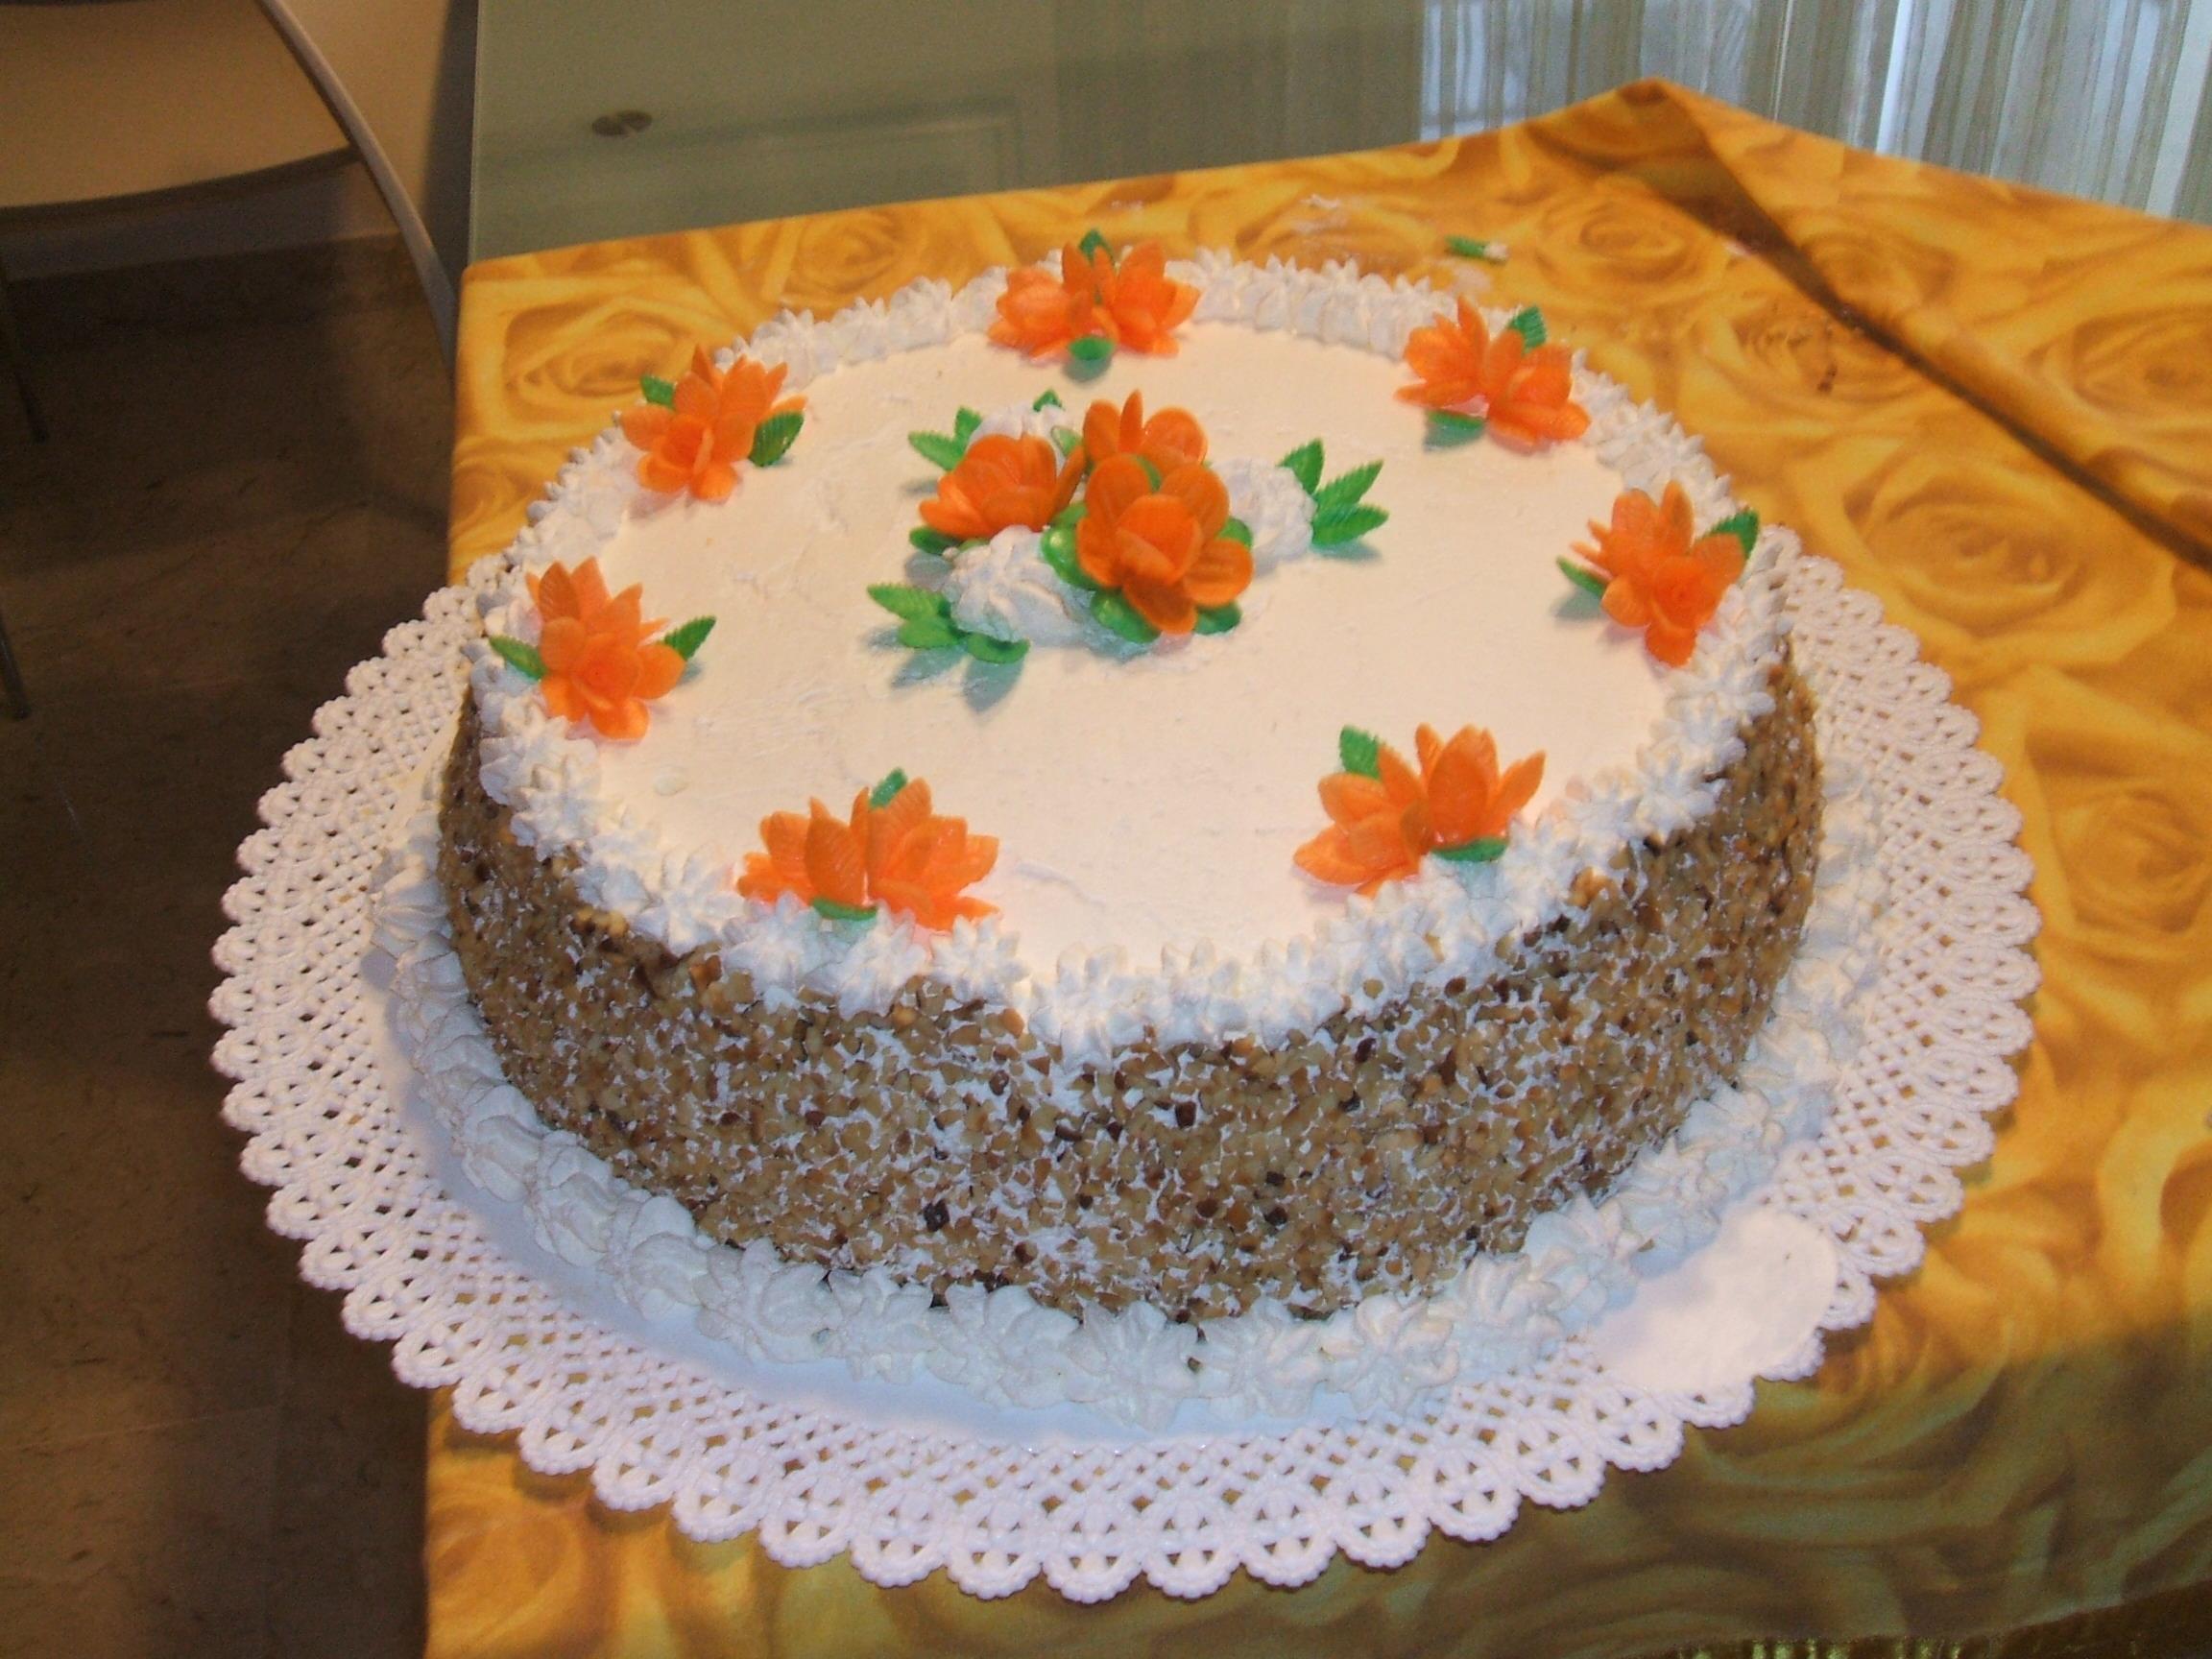 Torta decorata con fiori d 39 ostia - Decorazioni natalizie per torte ...